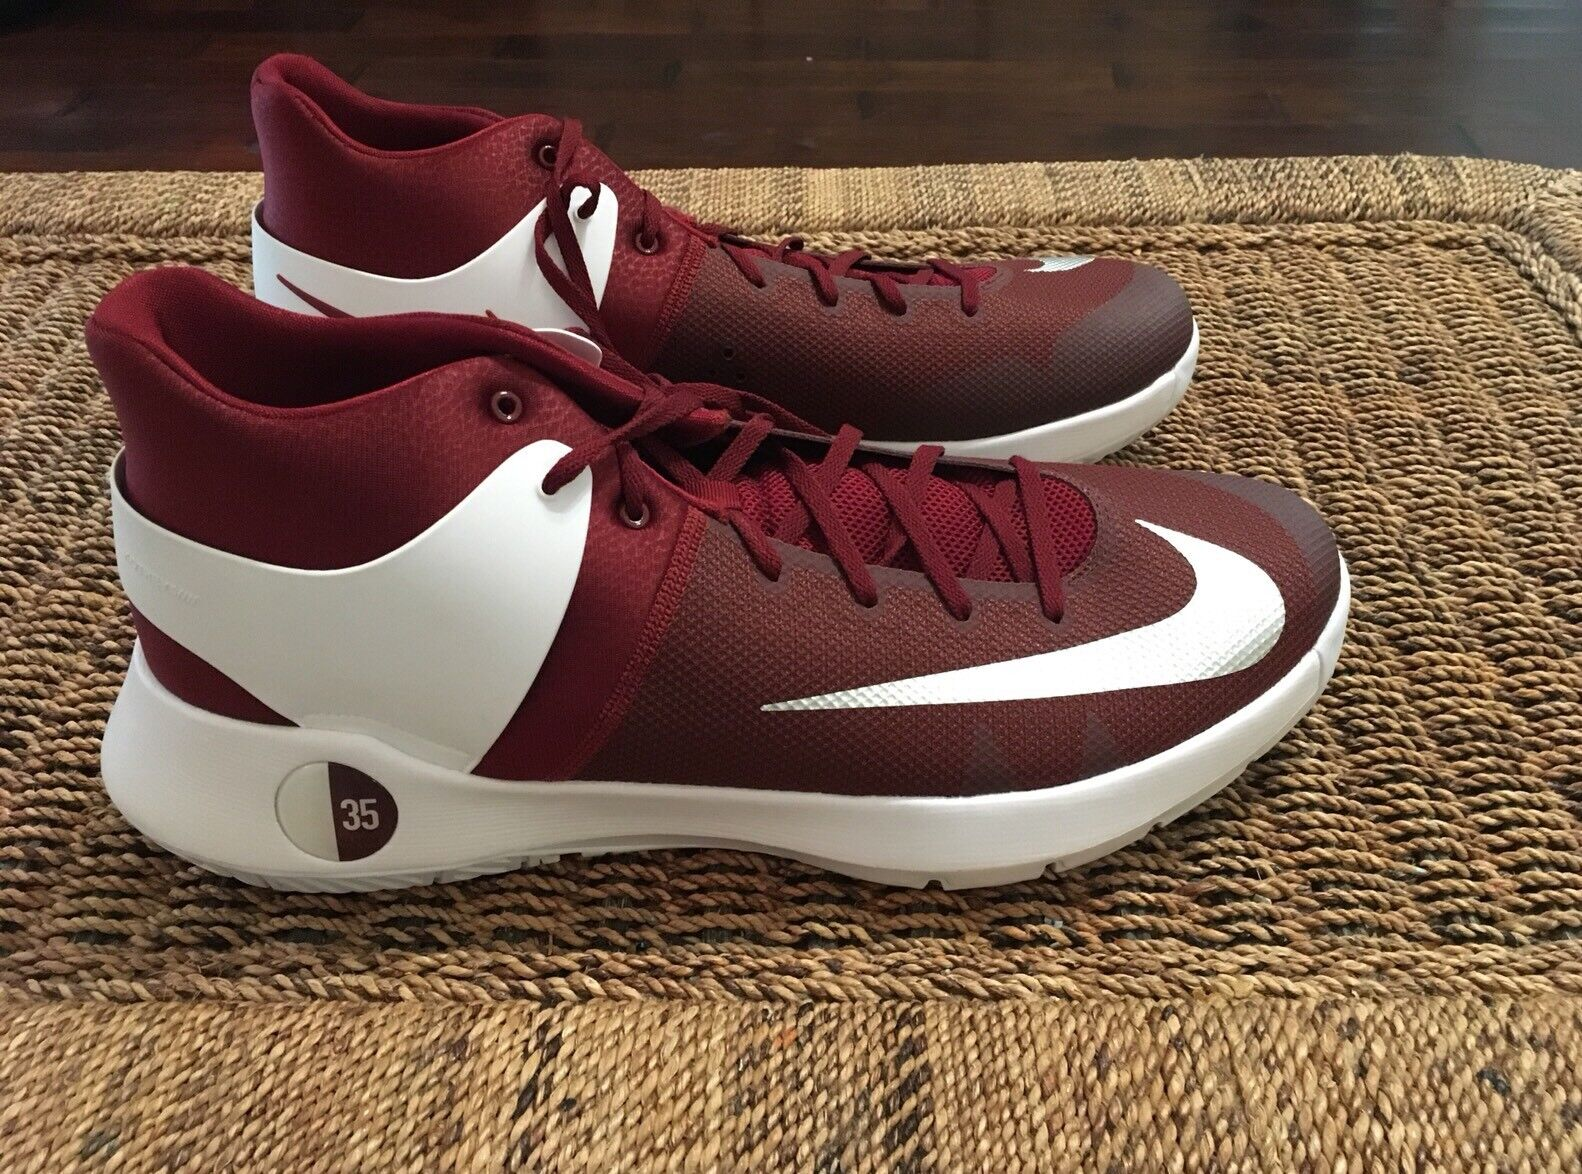 Nike Men's KD Trey 5 IV Zoom Basketball Shoes Sz. 18 NEW 856484-662 Cheap and beautiful fashion